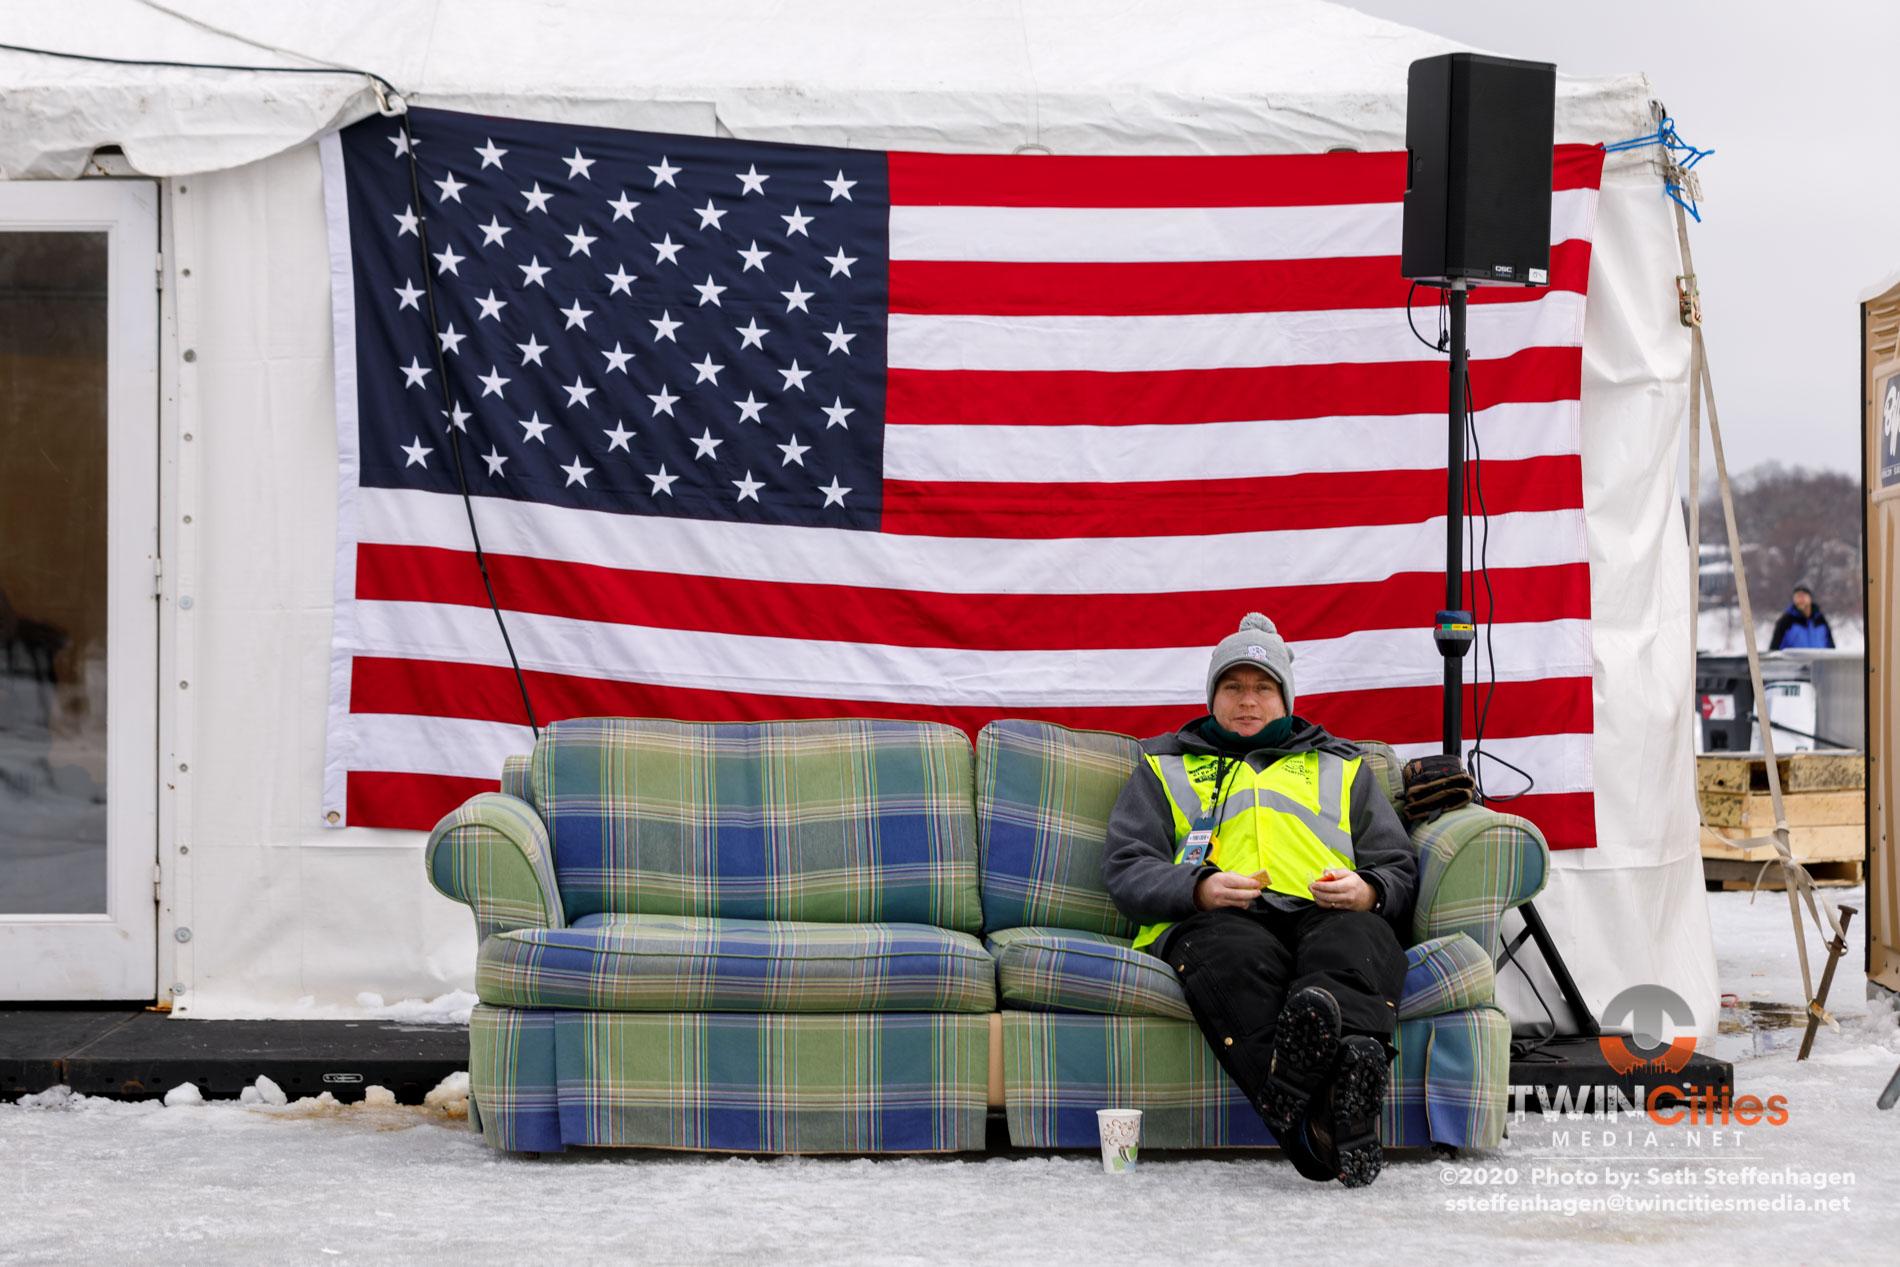 January 26, 2020 - Minneapolis, Minnesota, United States - Scenes from the U.S. Pond Hockey Championships on Lake Nokomis.   (Photo by Seth Steffenhagen/Steffenhagen Photography)